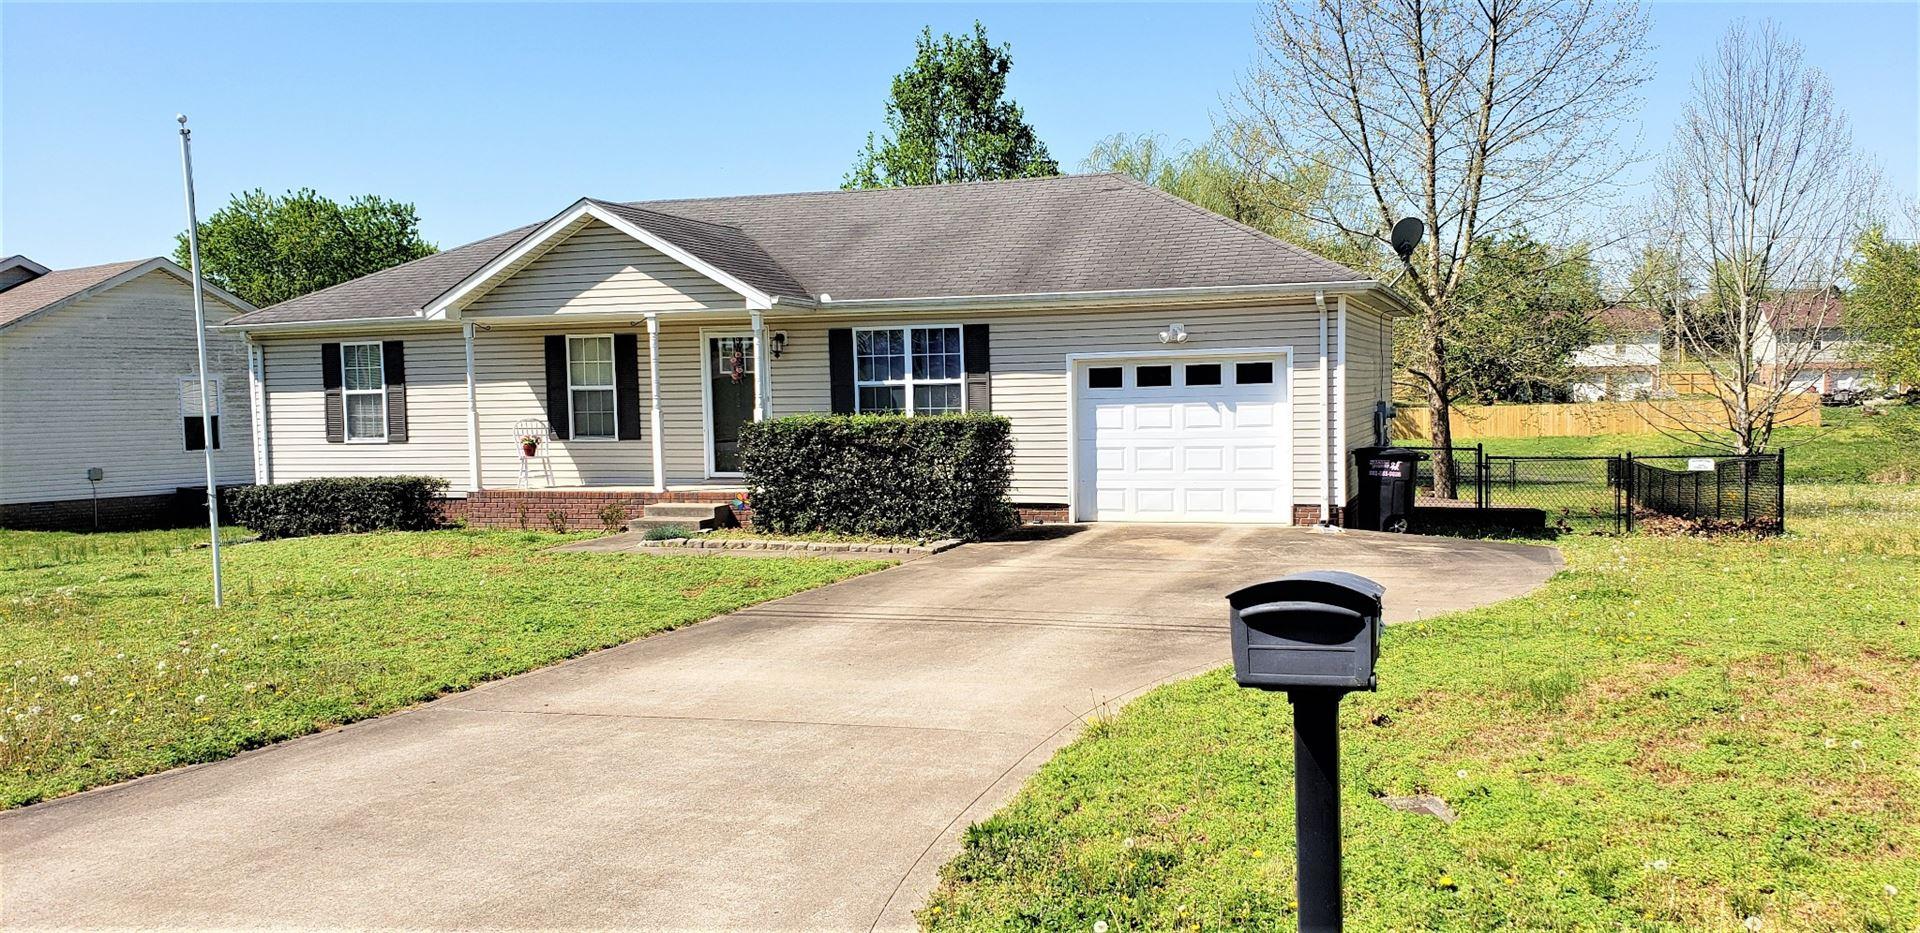 1854 Cottingham Ct, Clarksville, TN 37042 - MLS#: 2243689